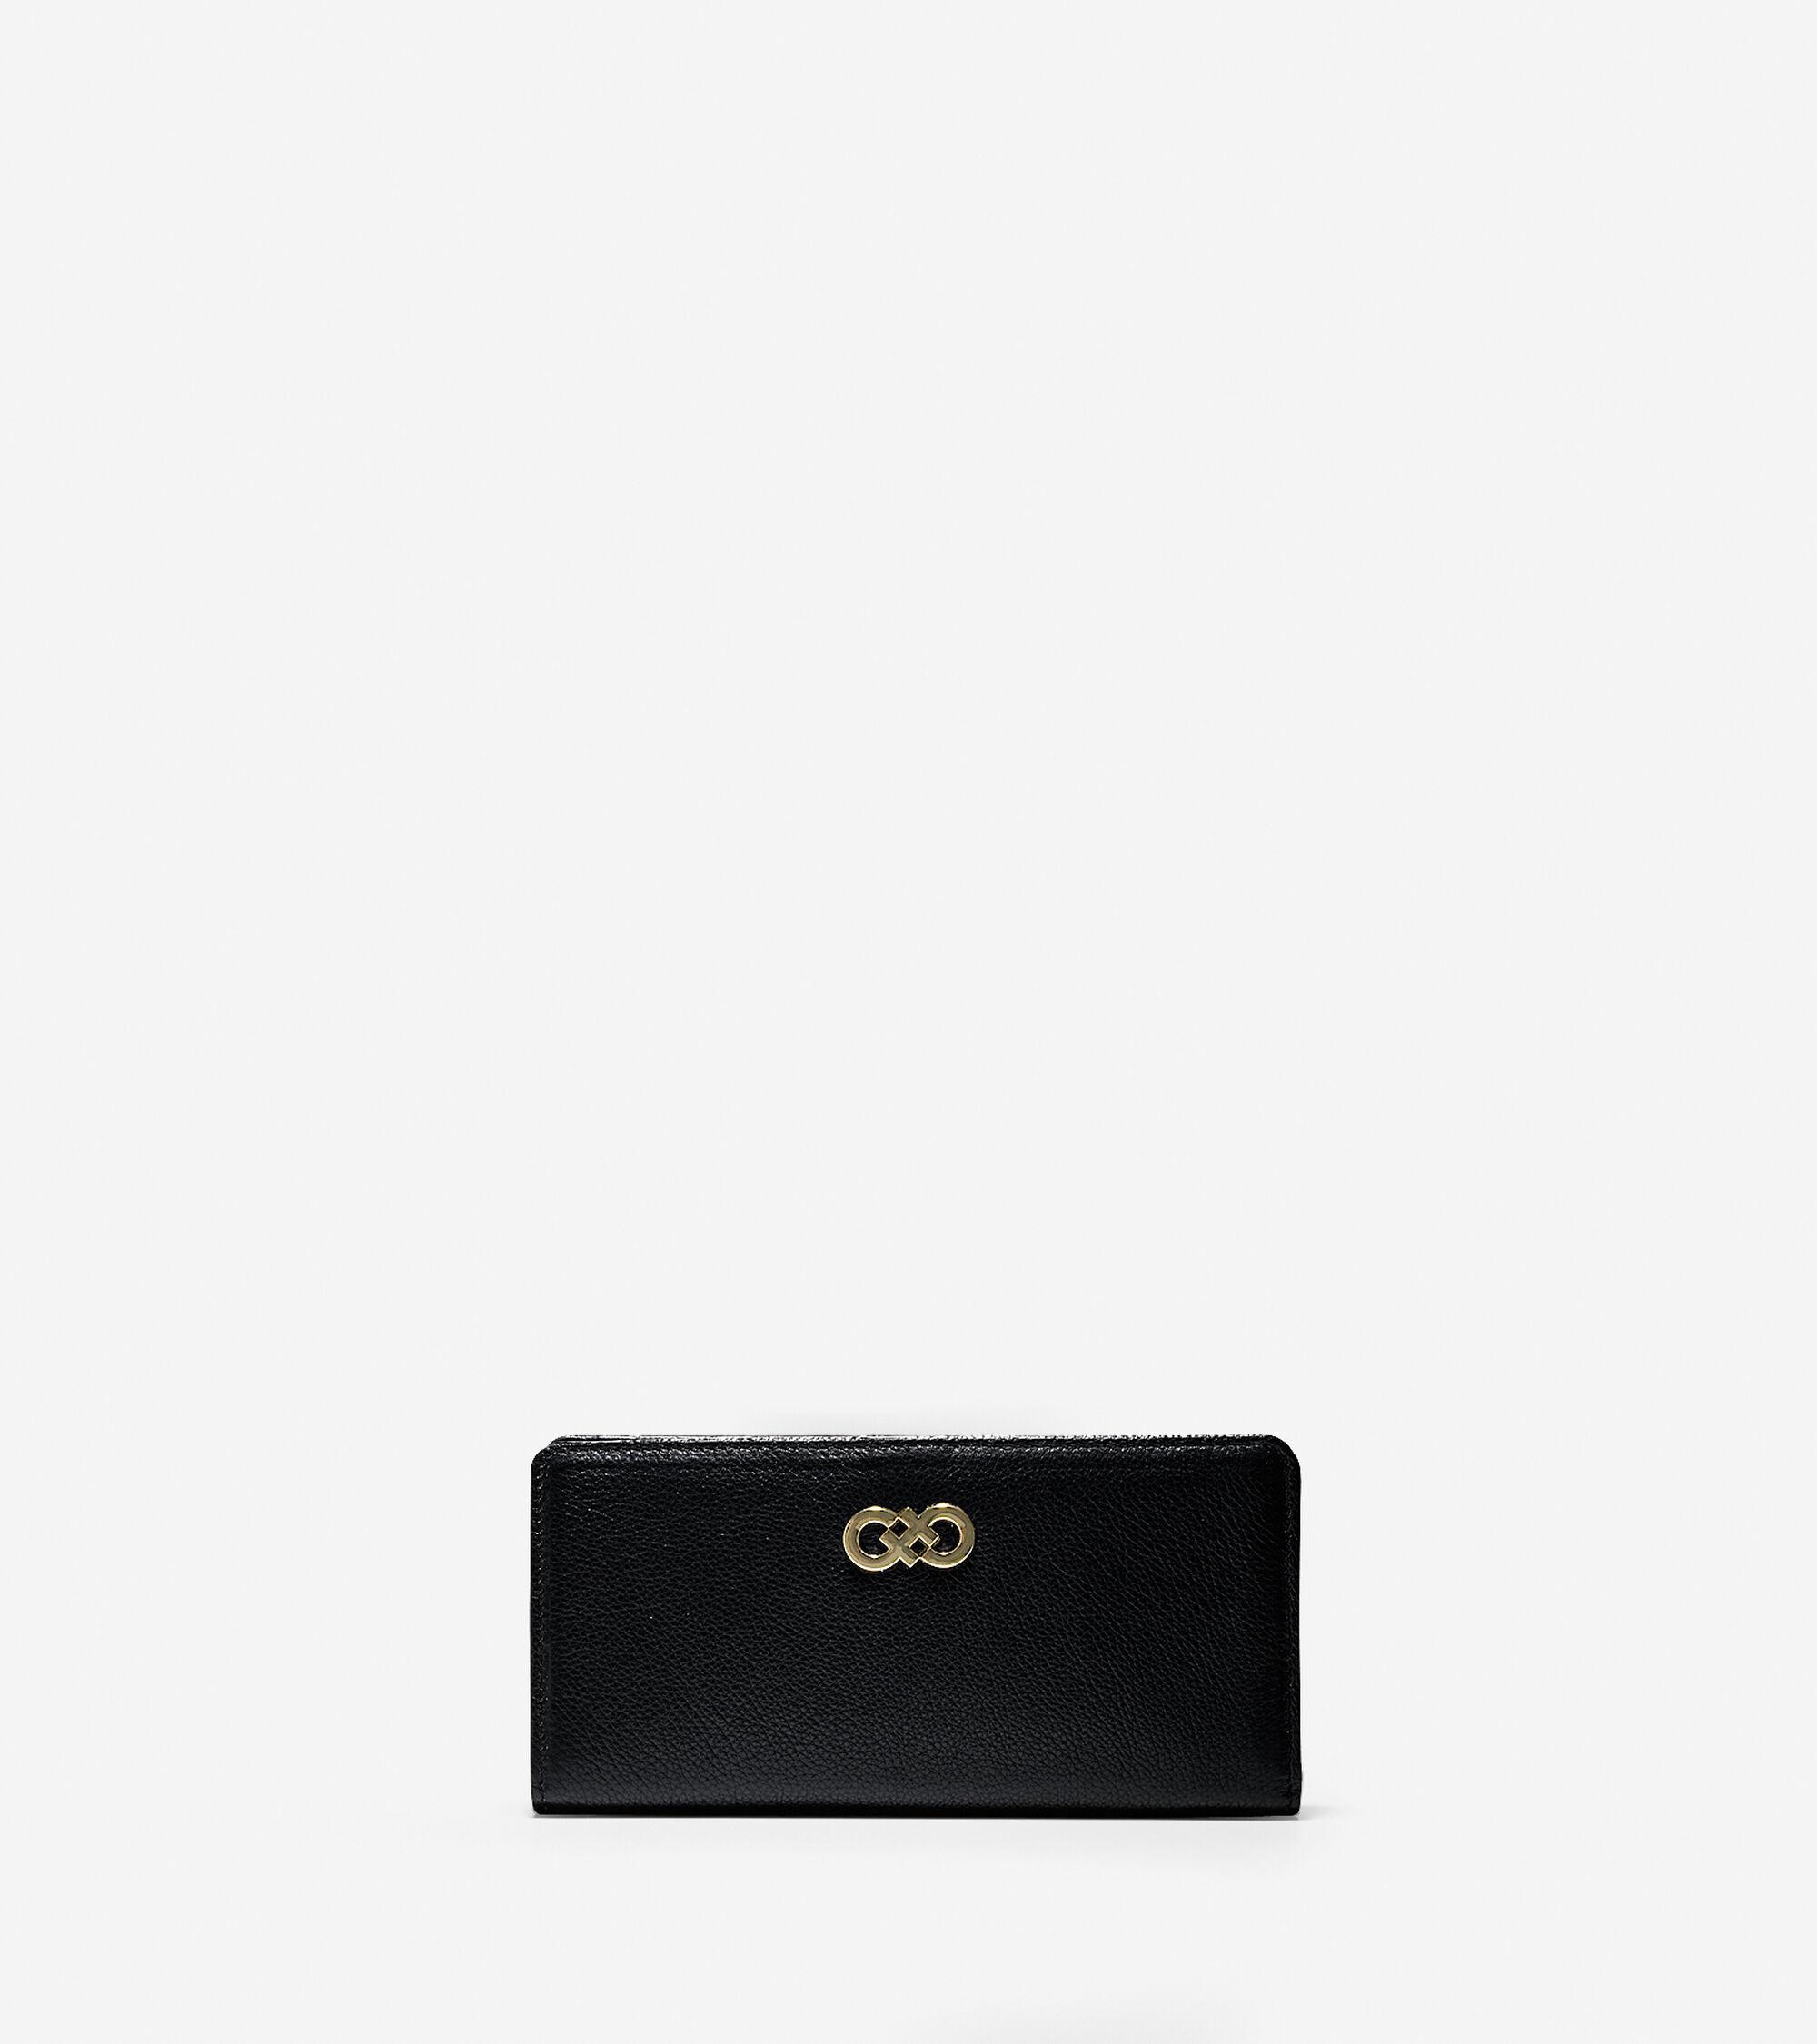 Accessories > Slim Wallet